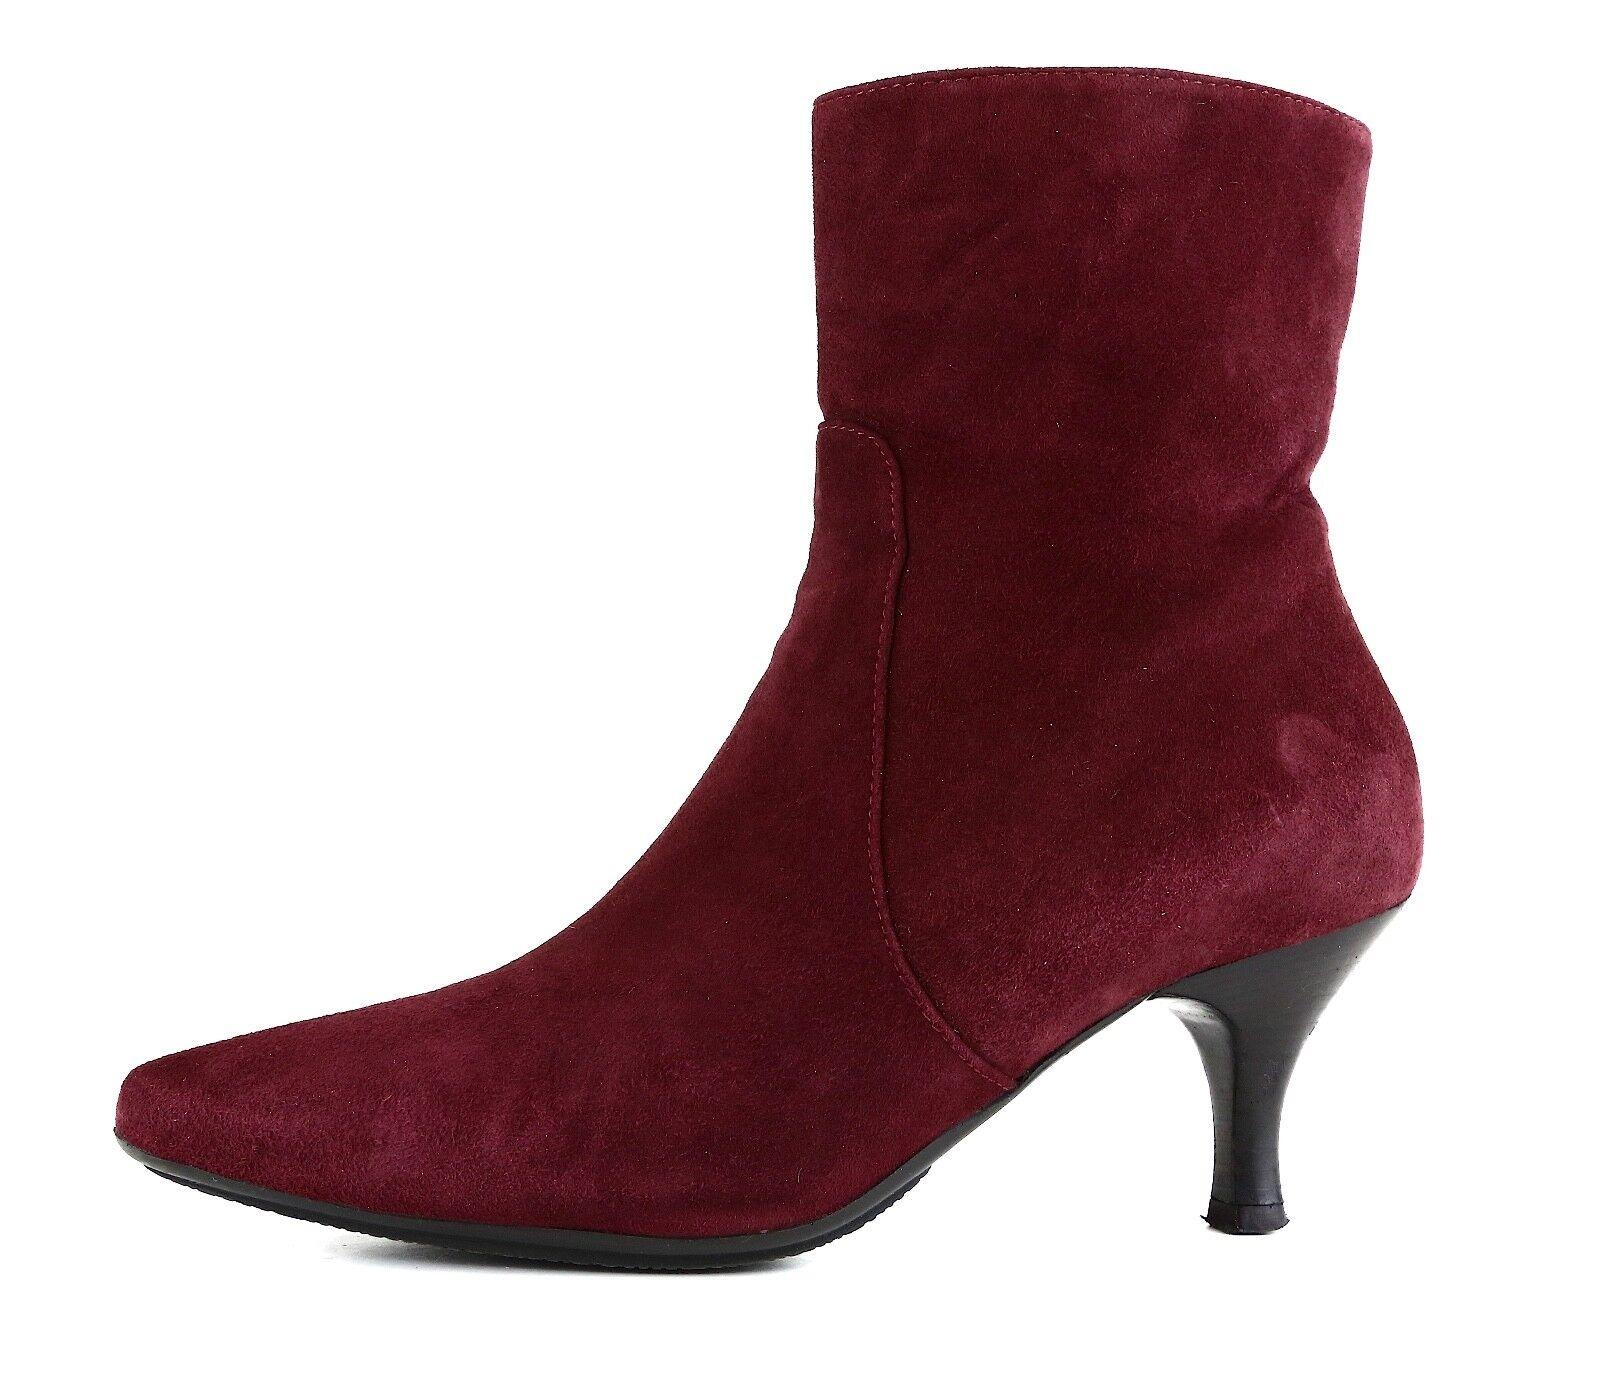 Aquatalia By Marvin K. Mila Suede Ankle Boot Burgundy Women Sz 6.5 5719 *